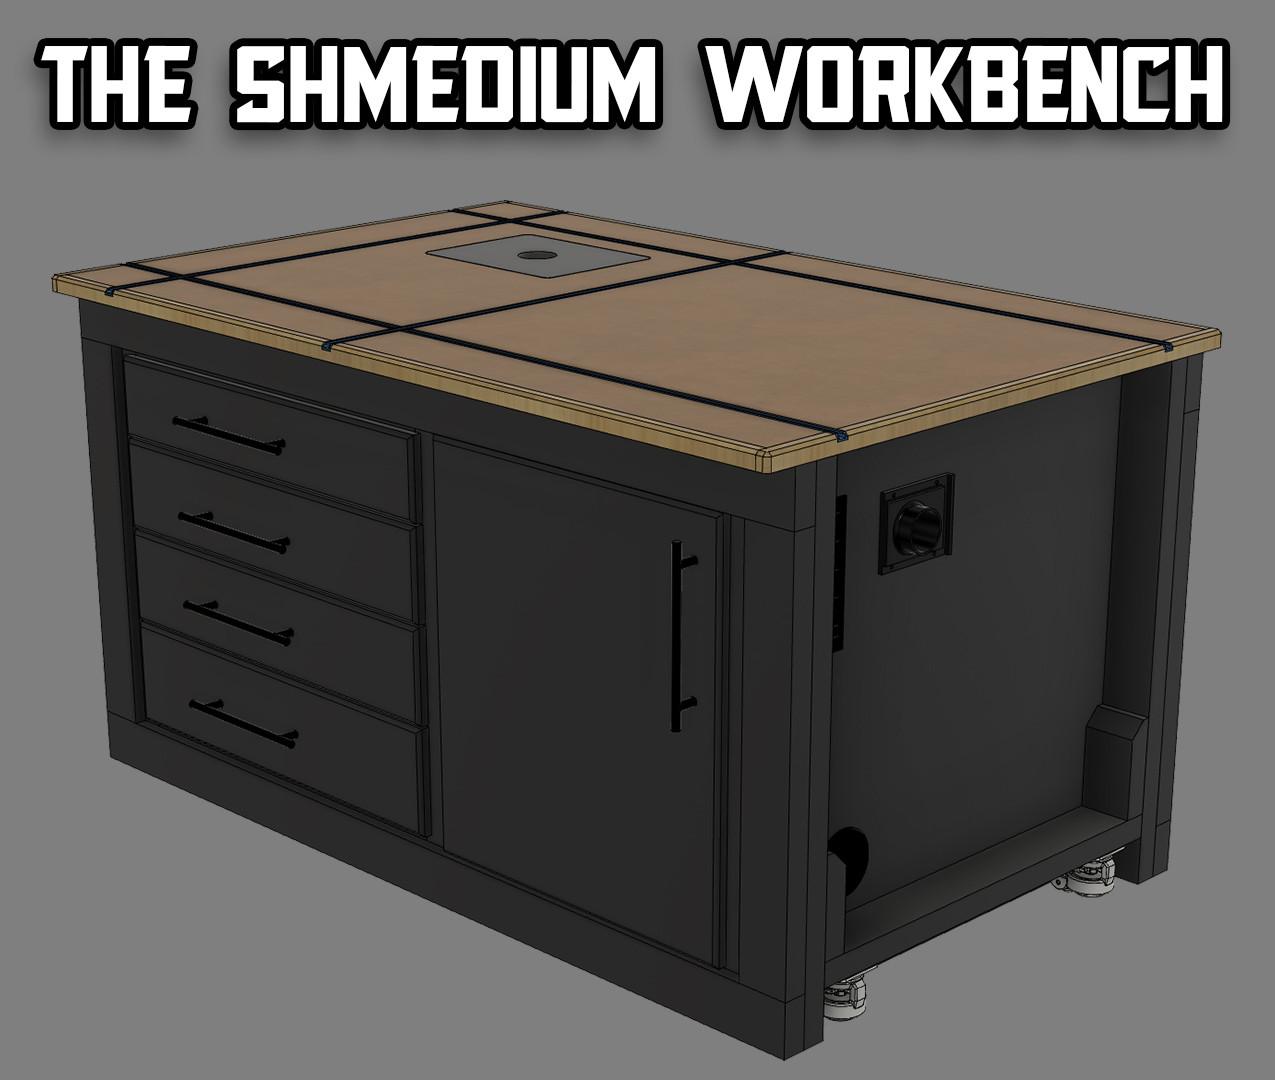 Shmedium Workbench Announcement3.jpg